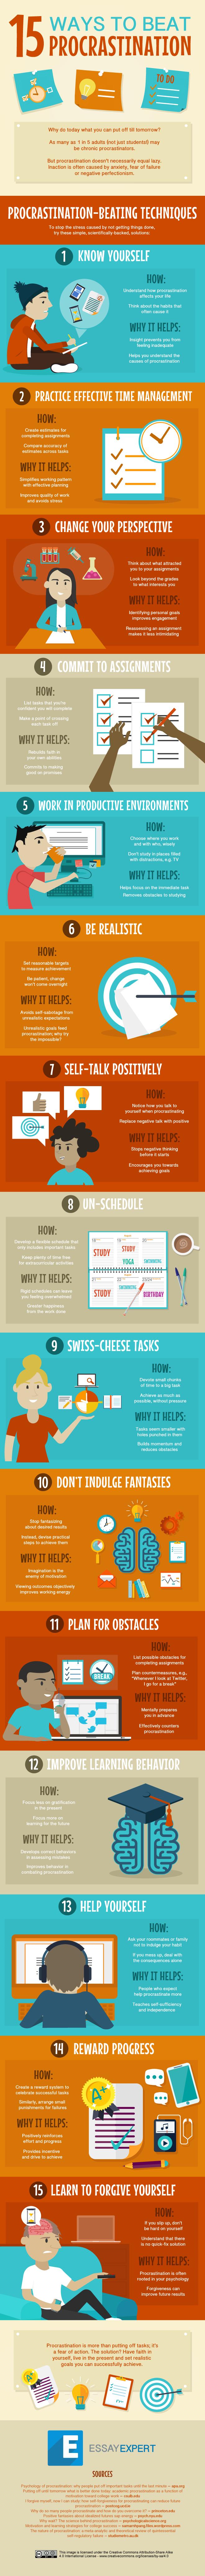 15-Ways-to-Beat-Procrastination